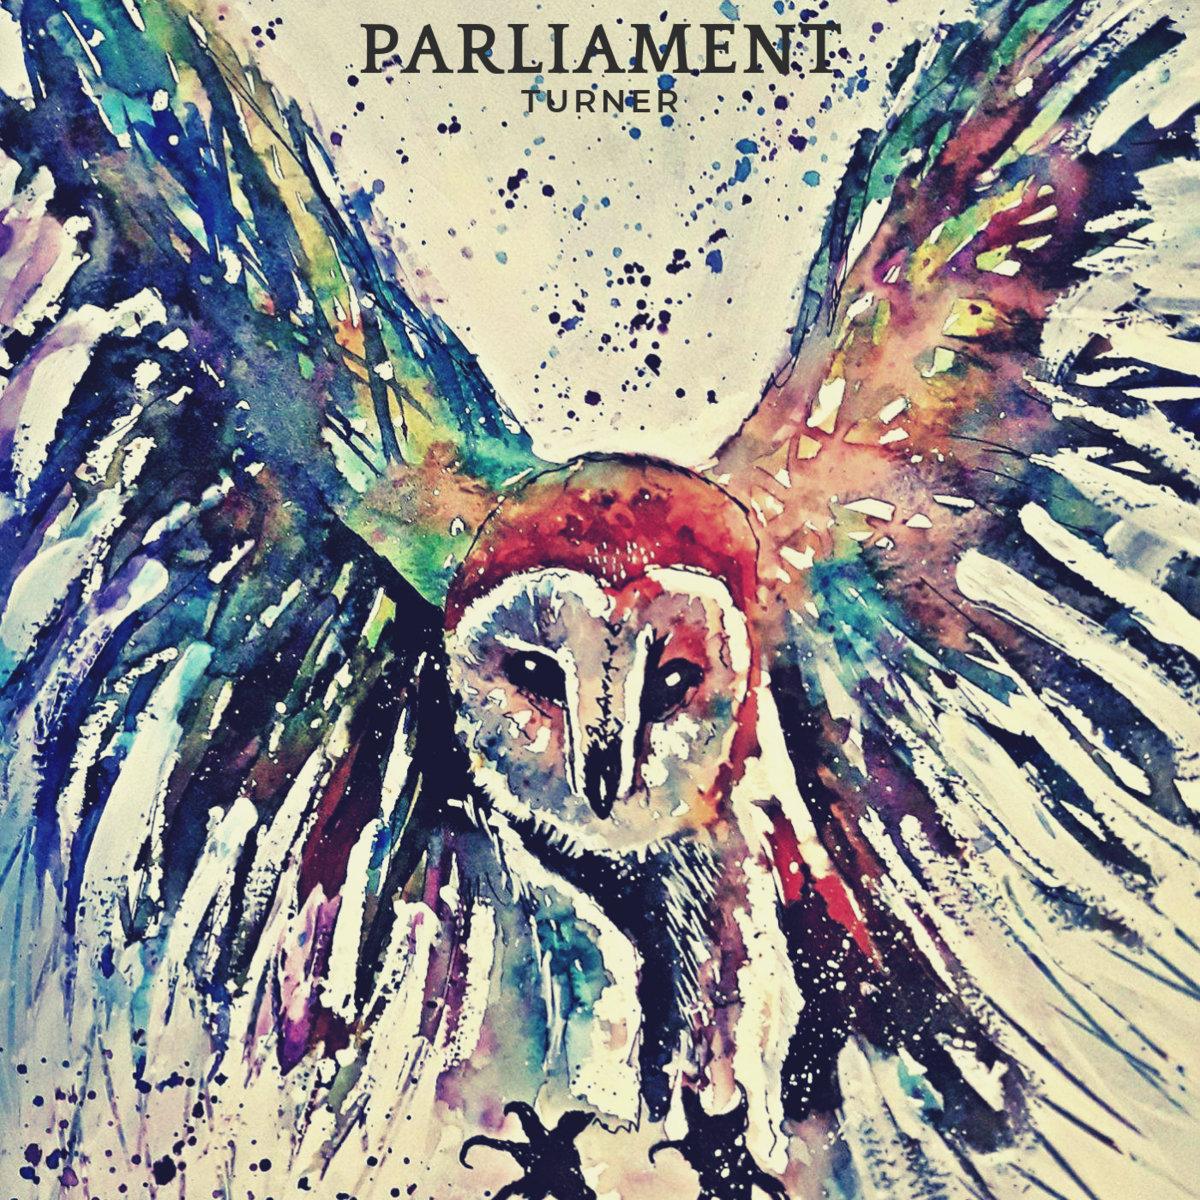 Turner - Parliament [EP] (2019)